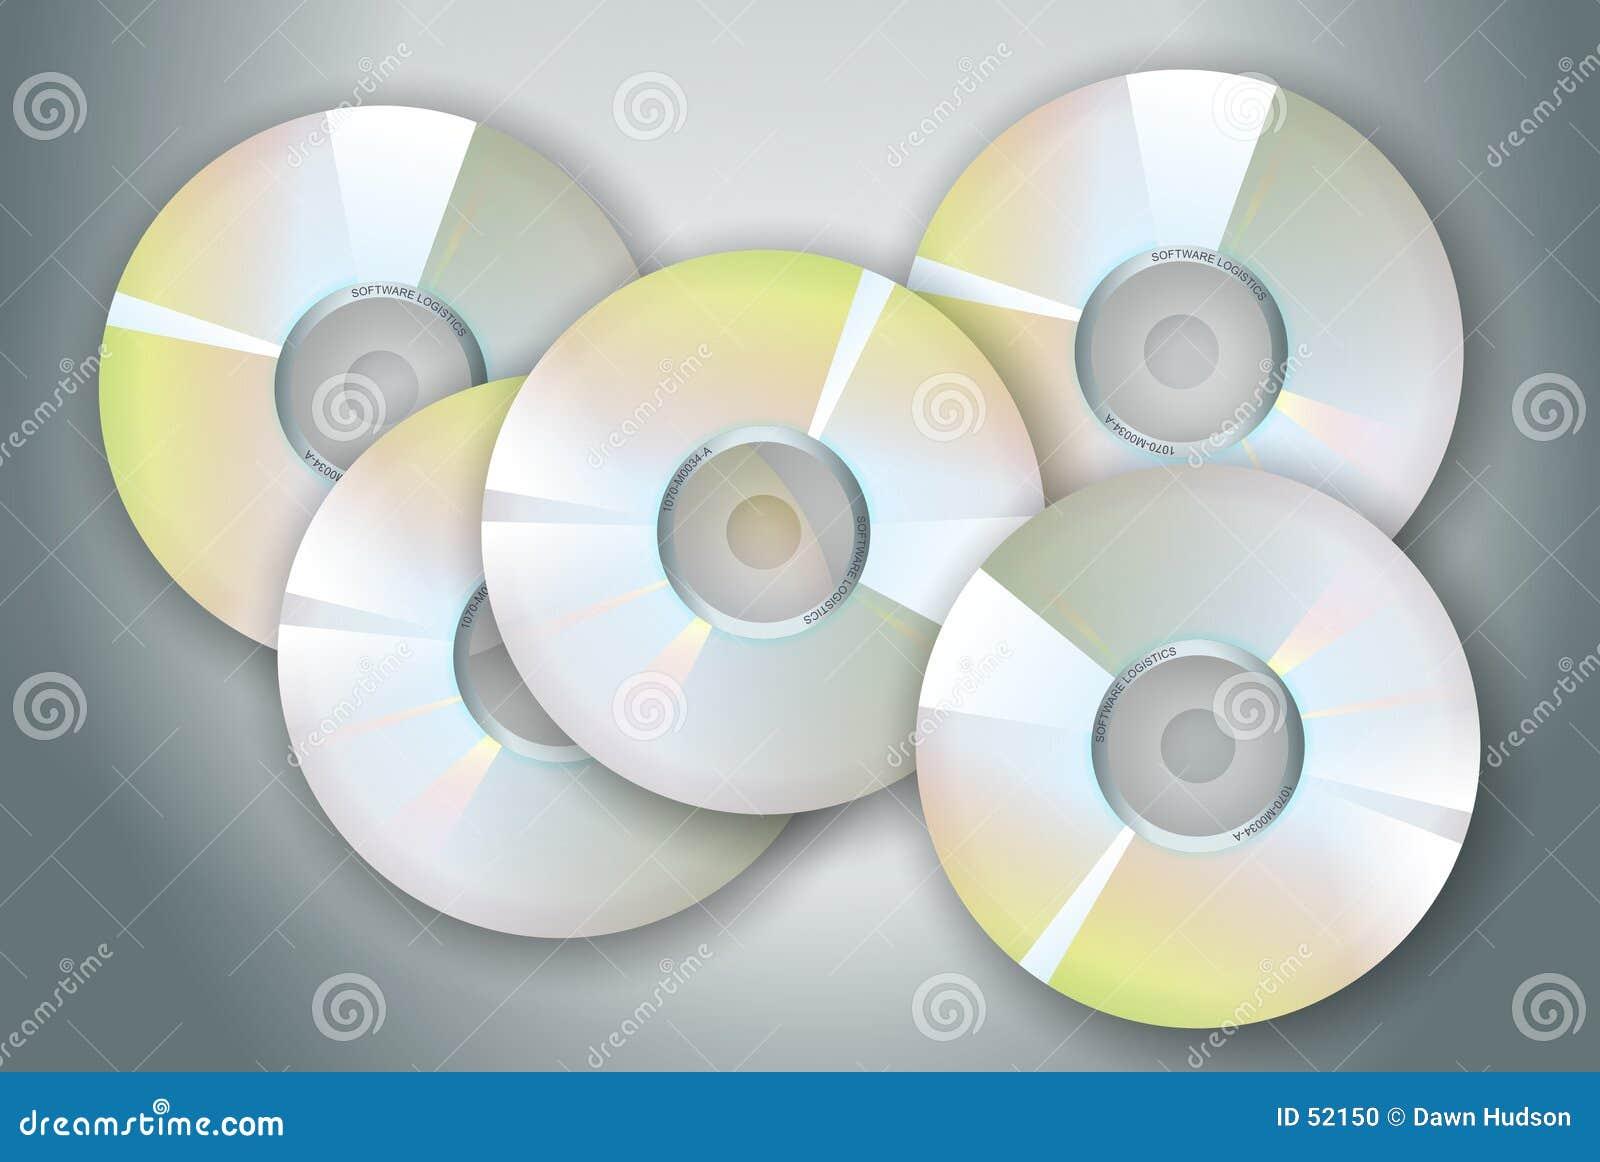 Download Disques compacts-ROM illustration stock. Illustration du medias - 52150